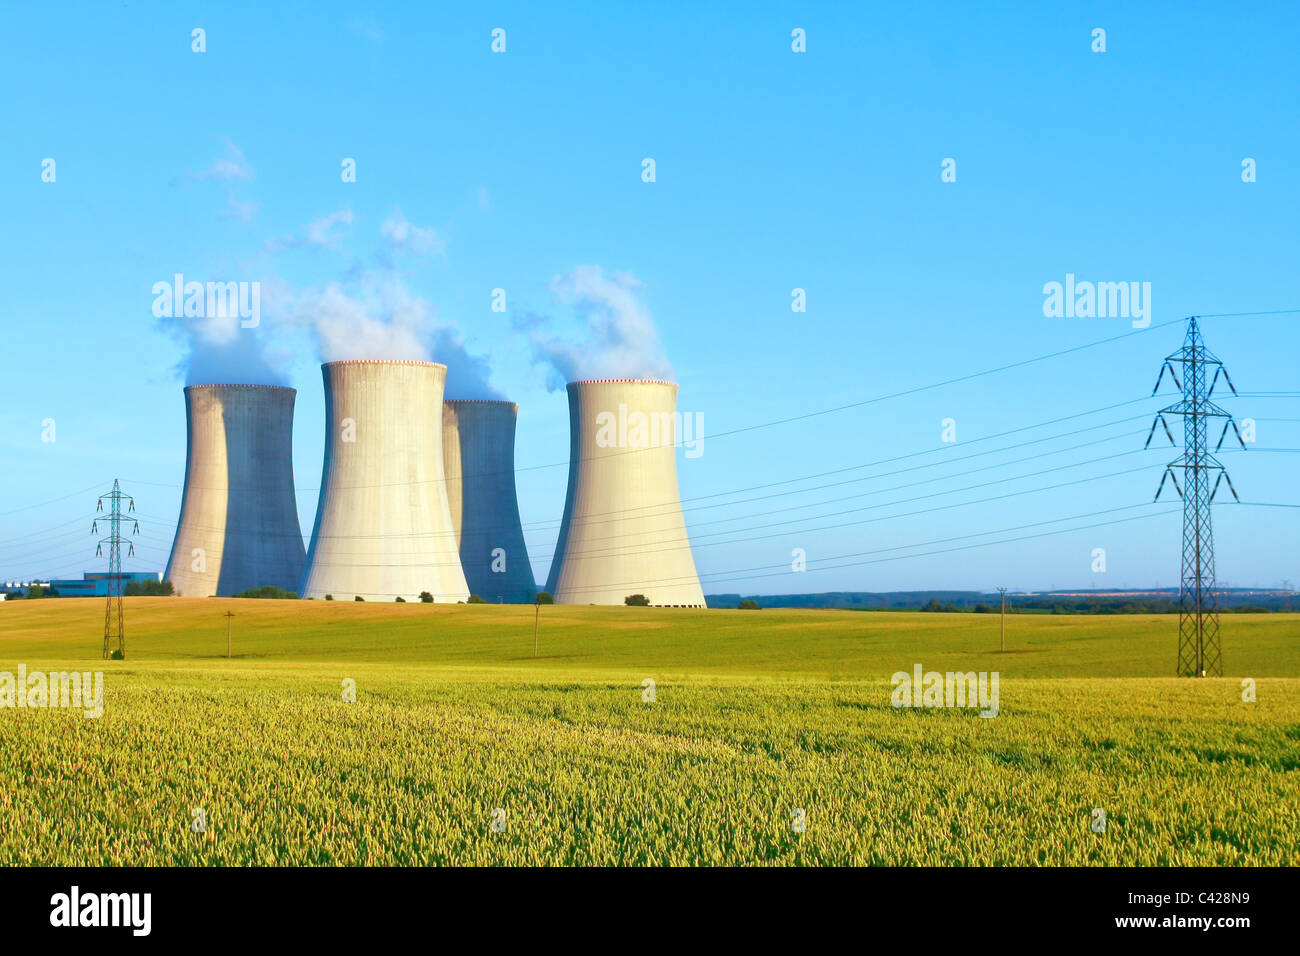 Nuclear power plant, Dukovany, Czech Republic - Stock Image